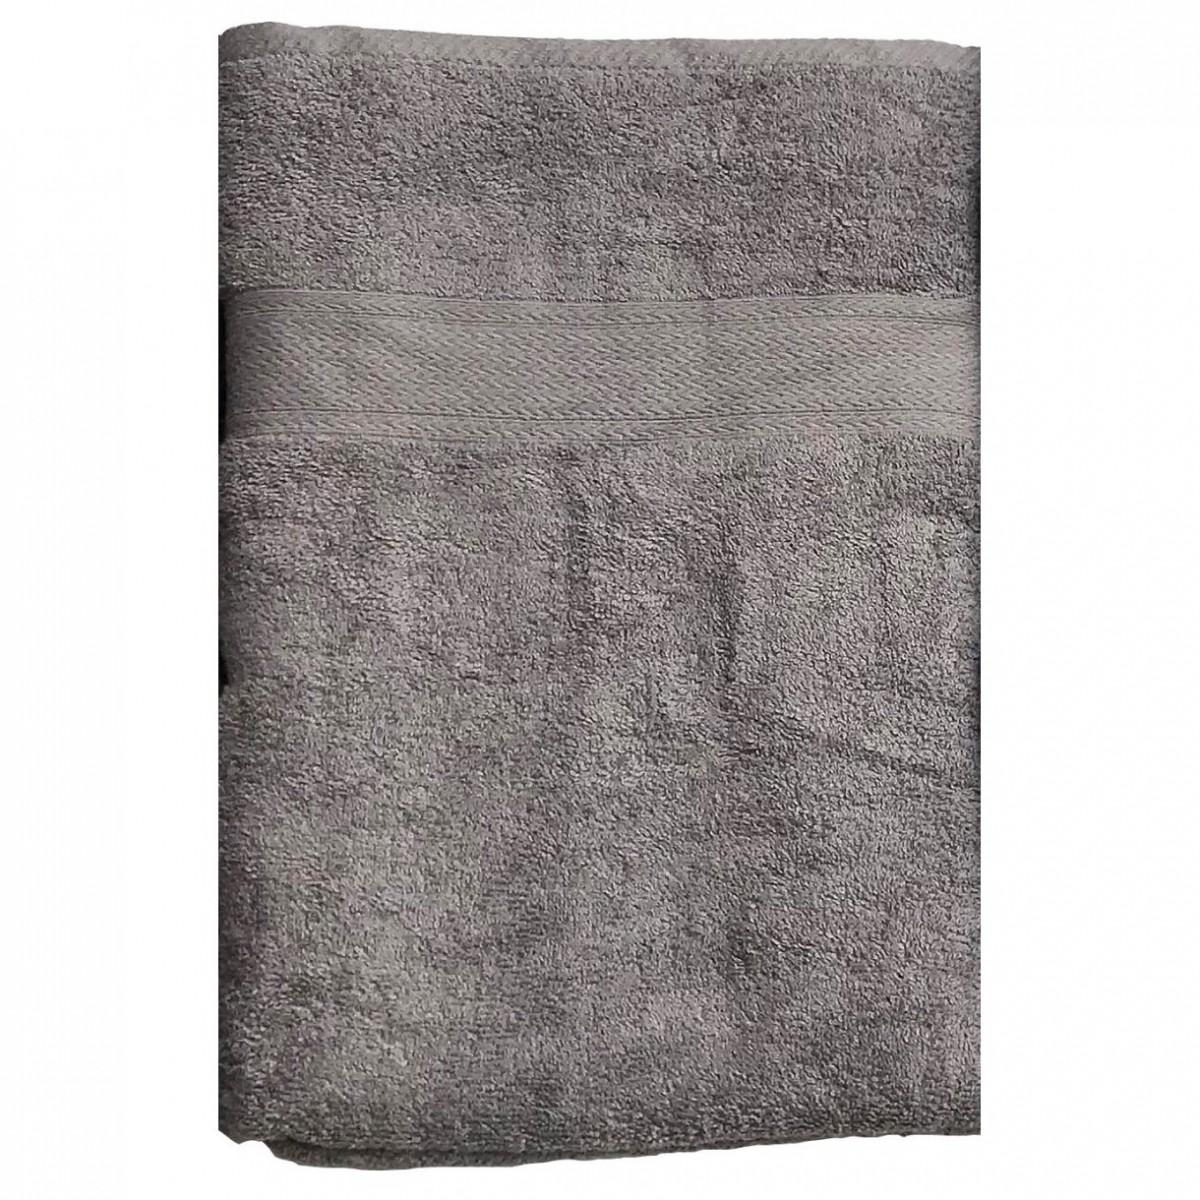 CONZEPT Håndklæde 90 x 180 cm grå